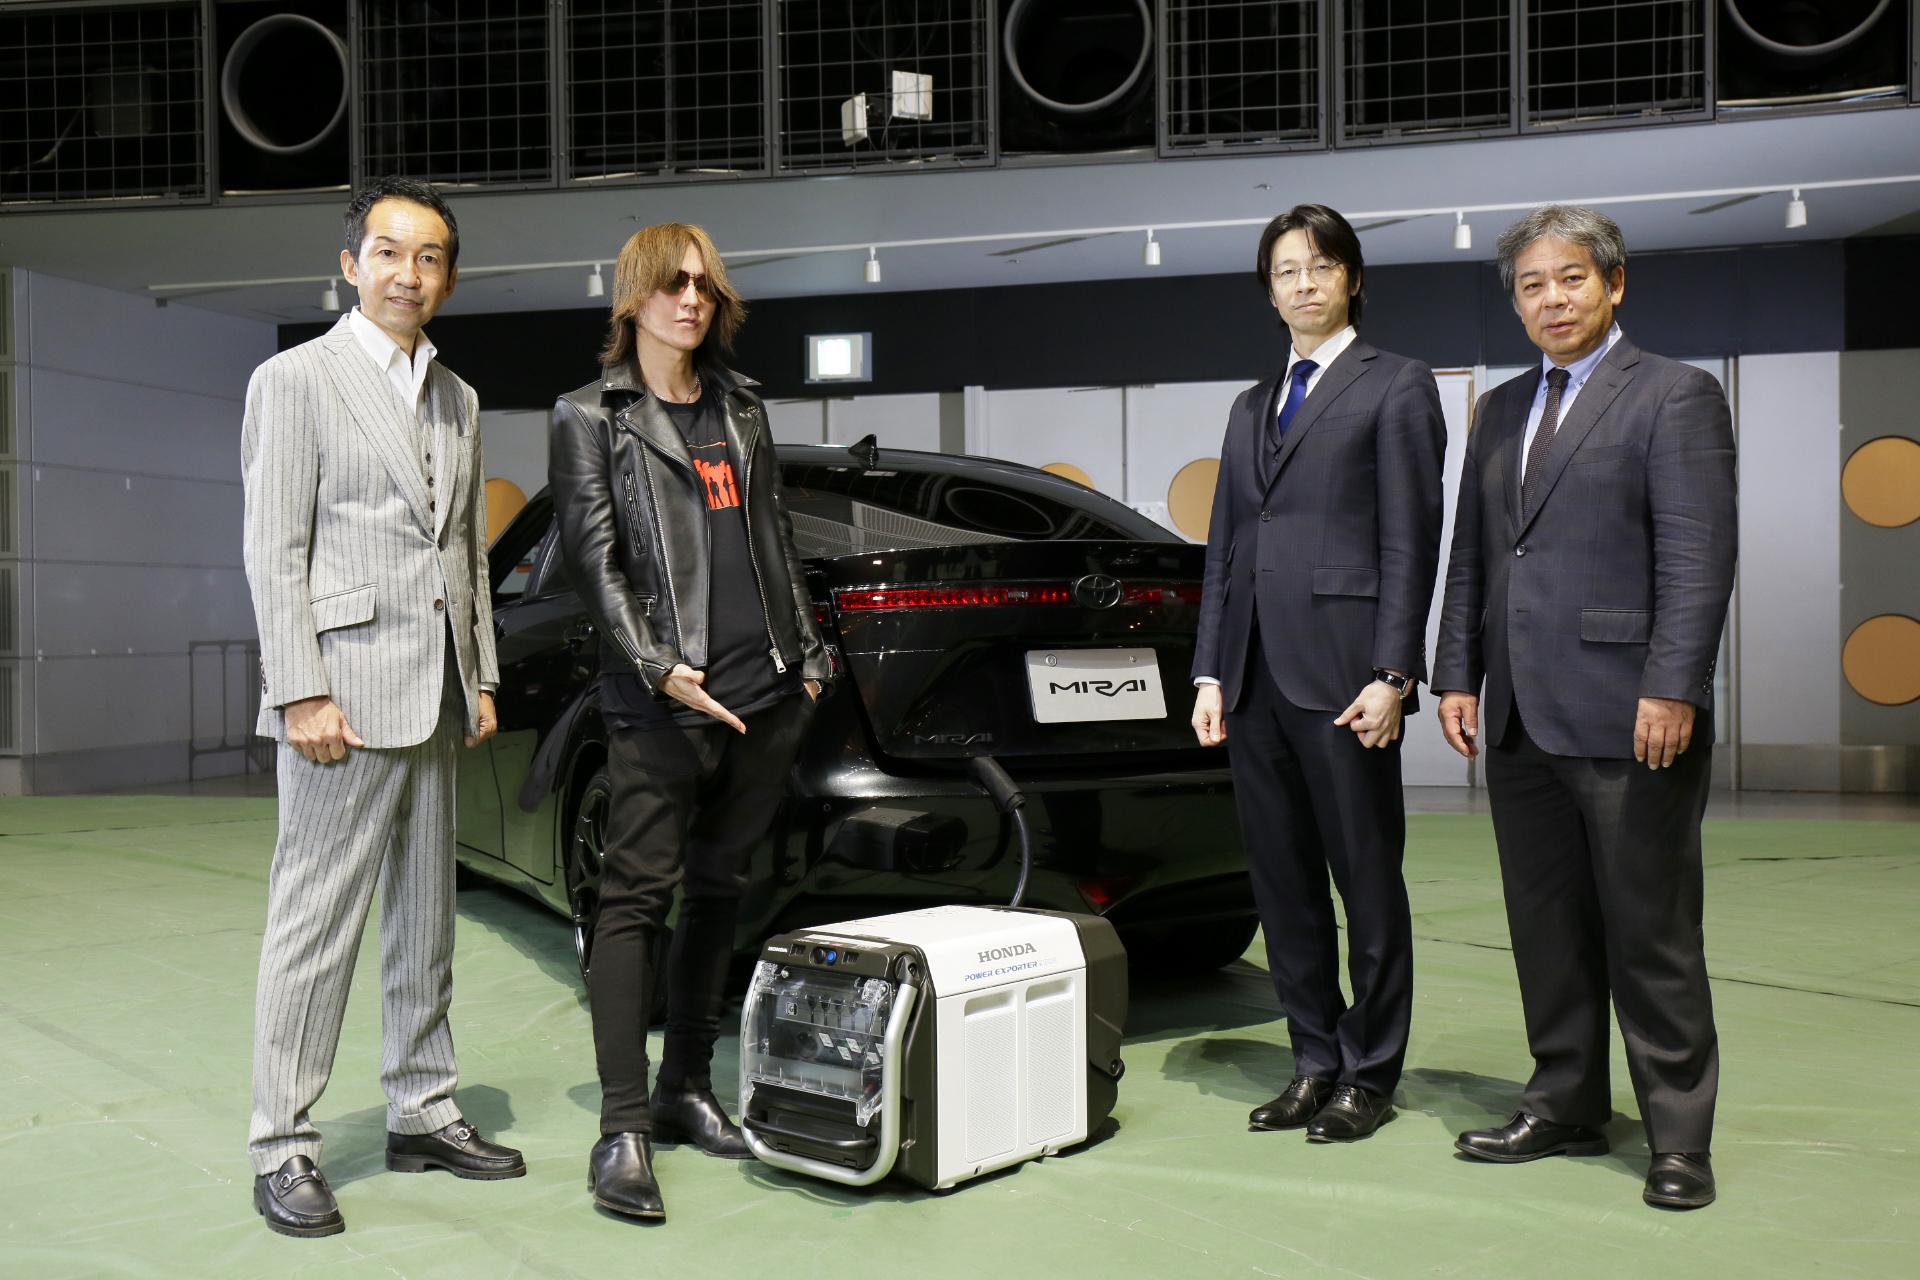 EY Japan、低炭素社会実現の加速を推進 世界的ロックバンドU2と連携し水素コンサートを実現(JPG)